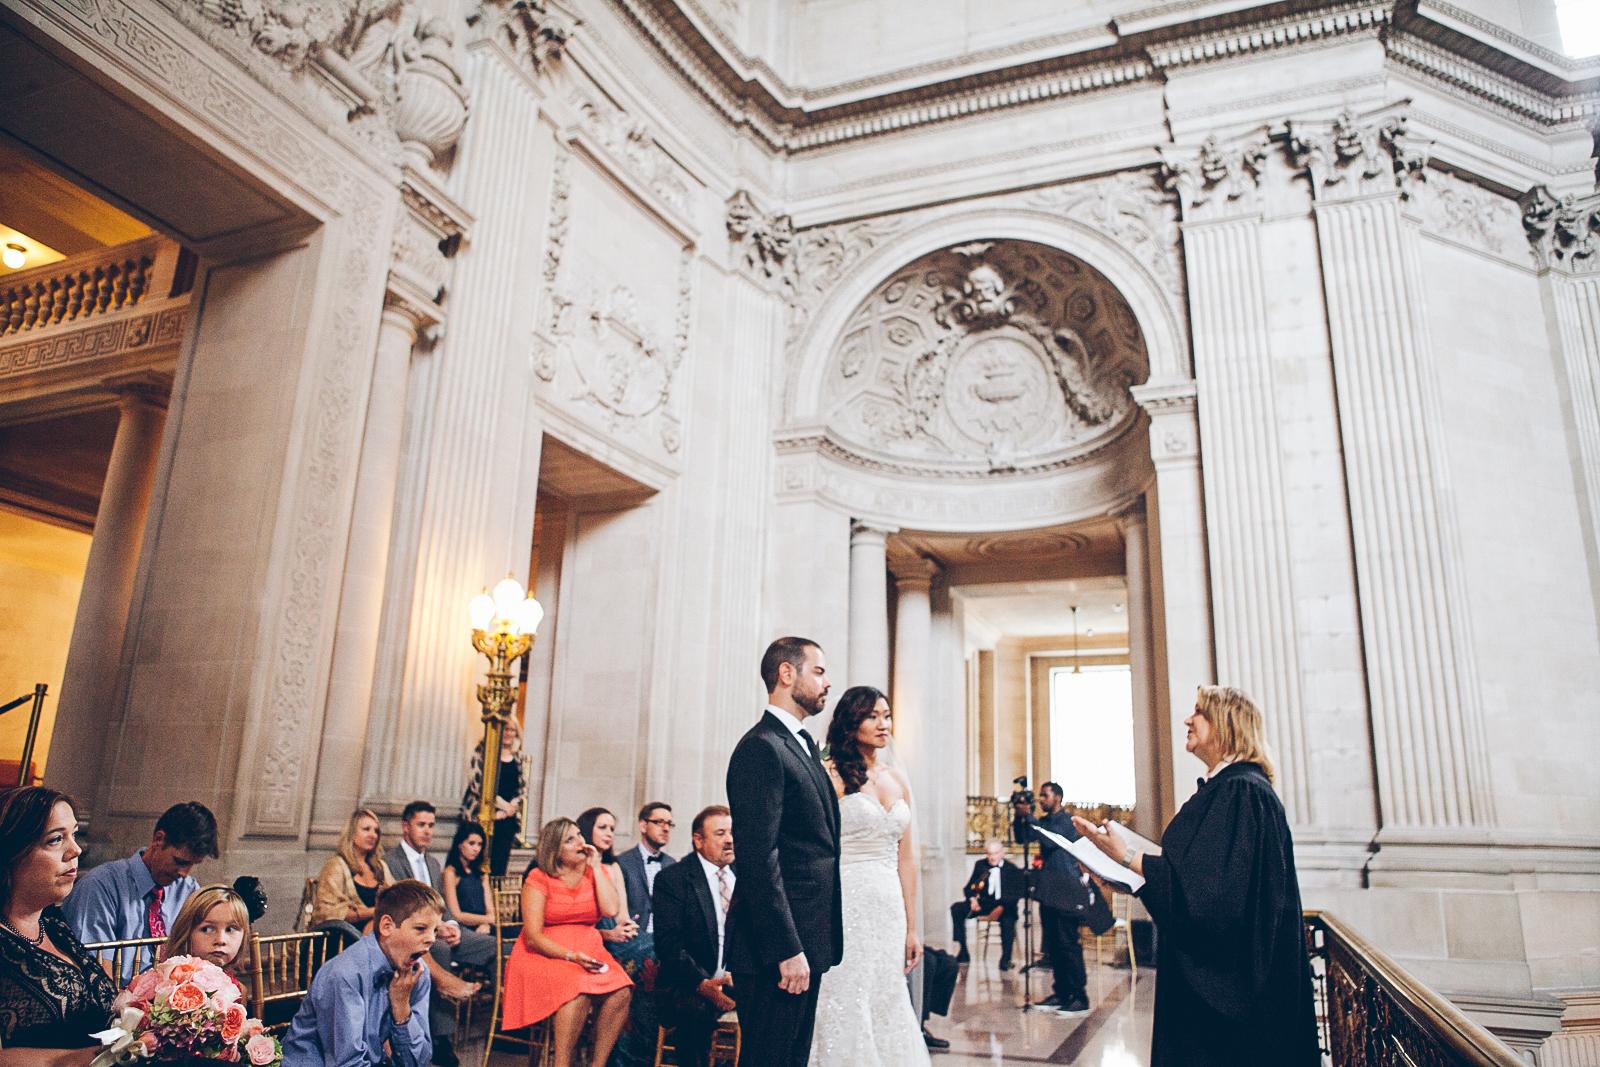 San_francisco_city_hall_wedding_photography_meegan_travis_ebony_siovhan_bokeh_photography_17.jpg